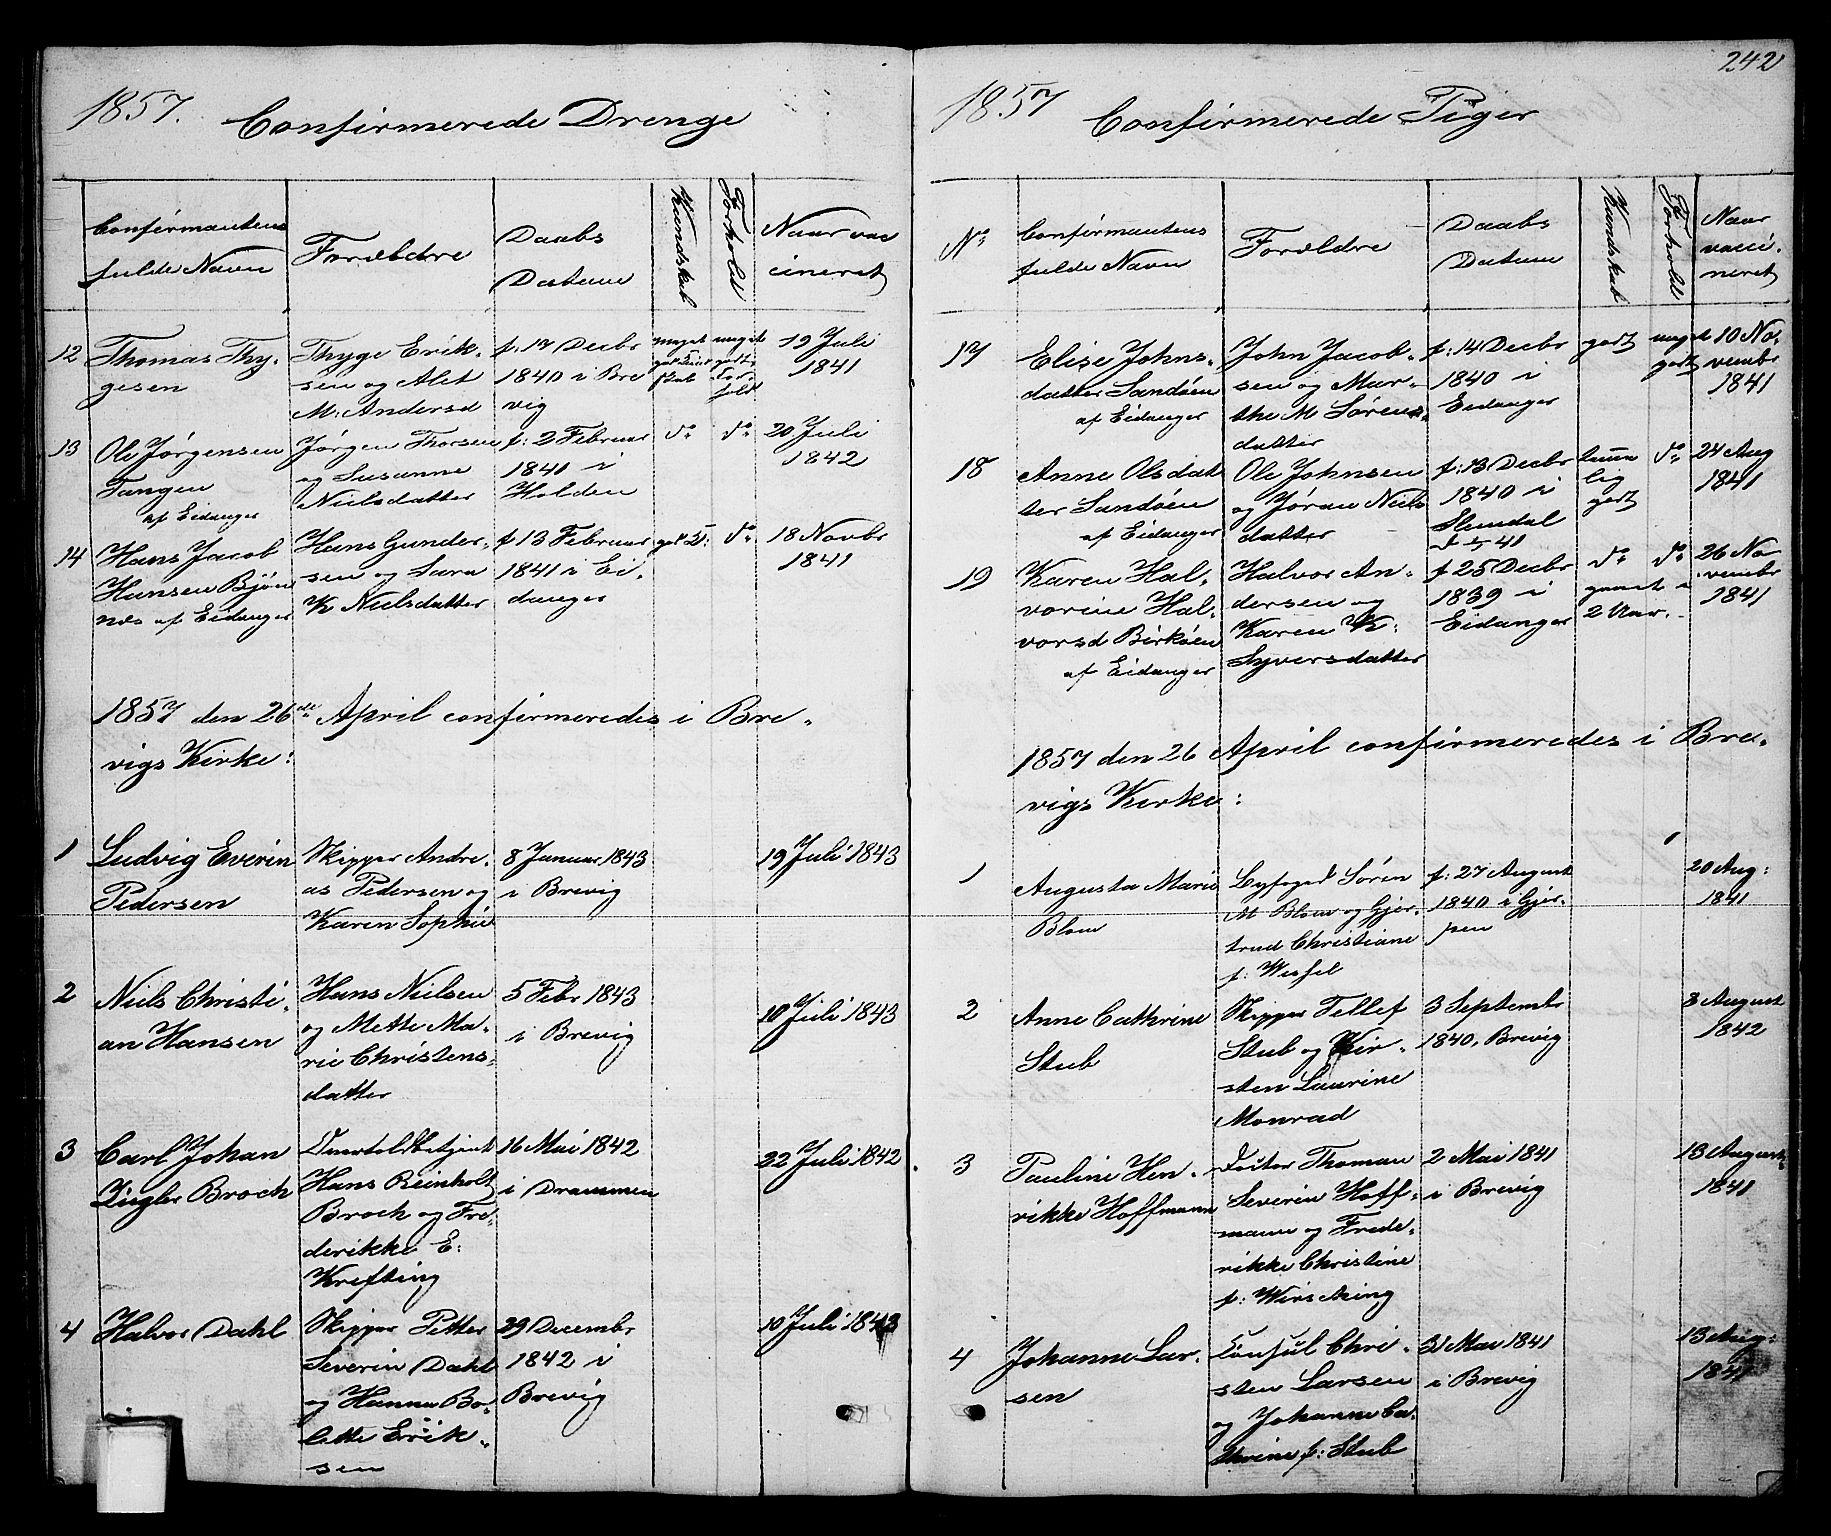 SAKO, Brevik kirkebøker, G/Ga/L0002: Klokkerbok nr. 2, 1846-1865, s. 242